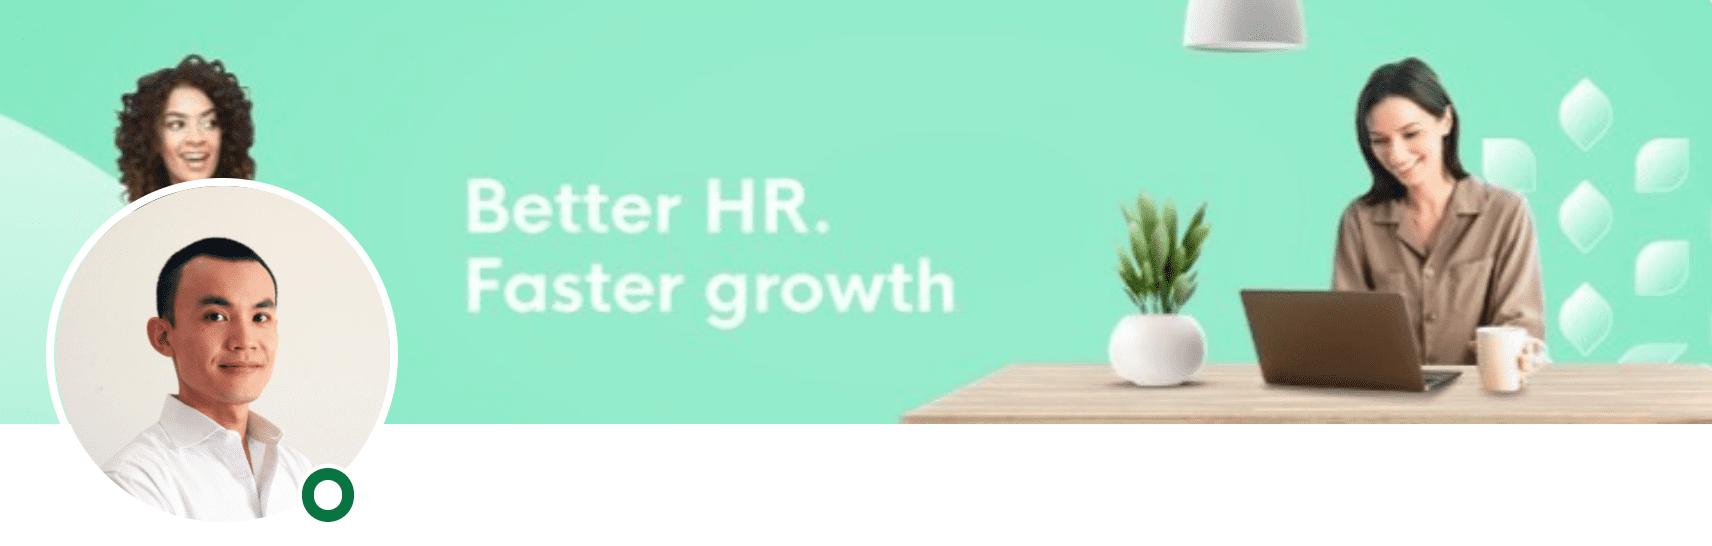 Grove HR - HR influencers - Bao Nguyen